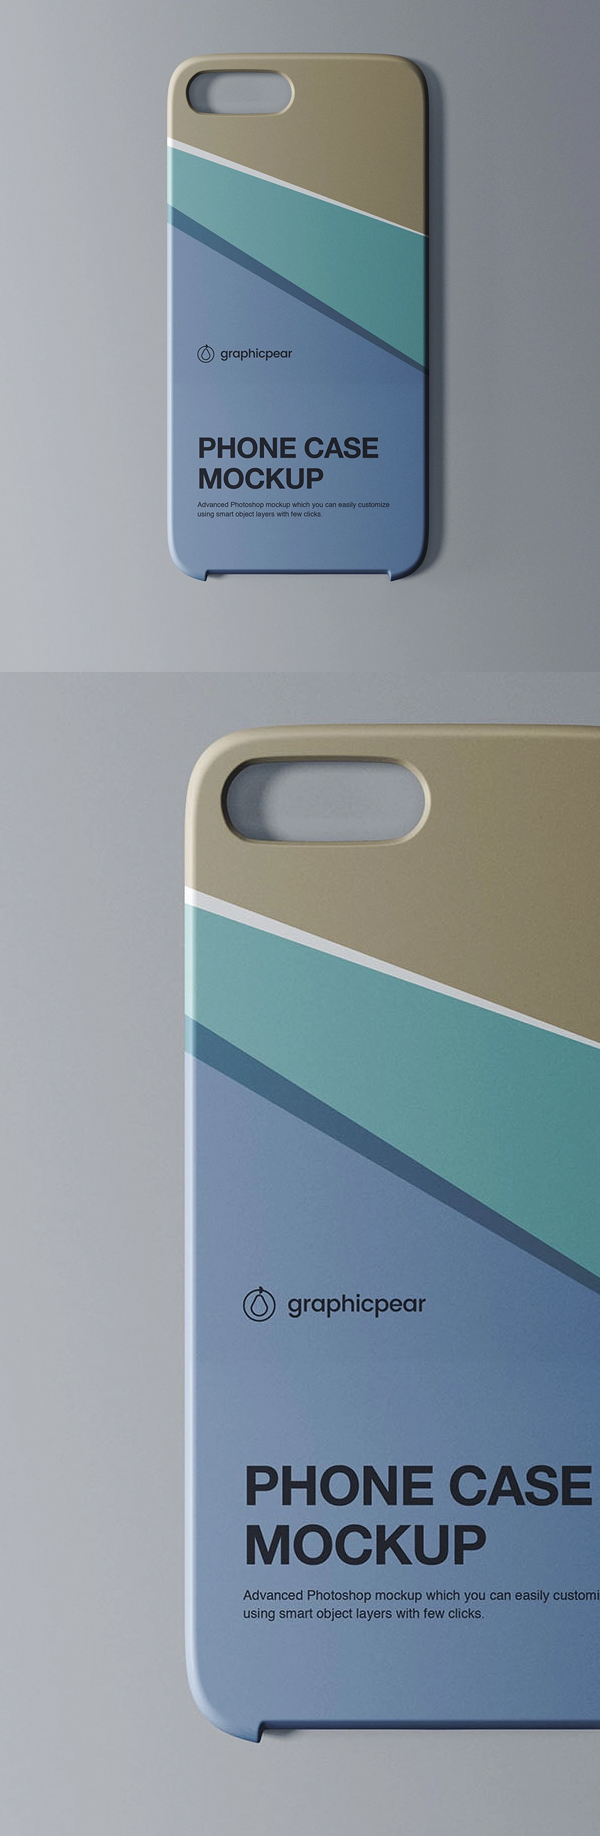 Free Phone Case Mockup